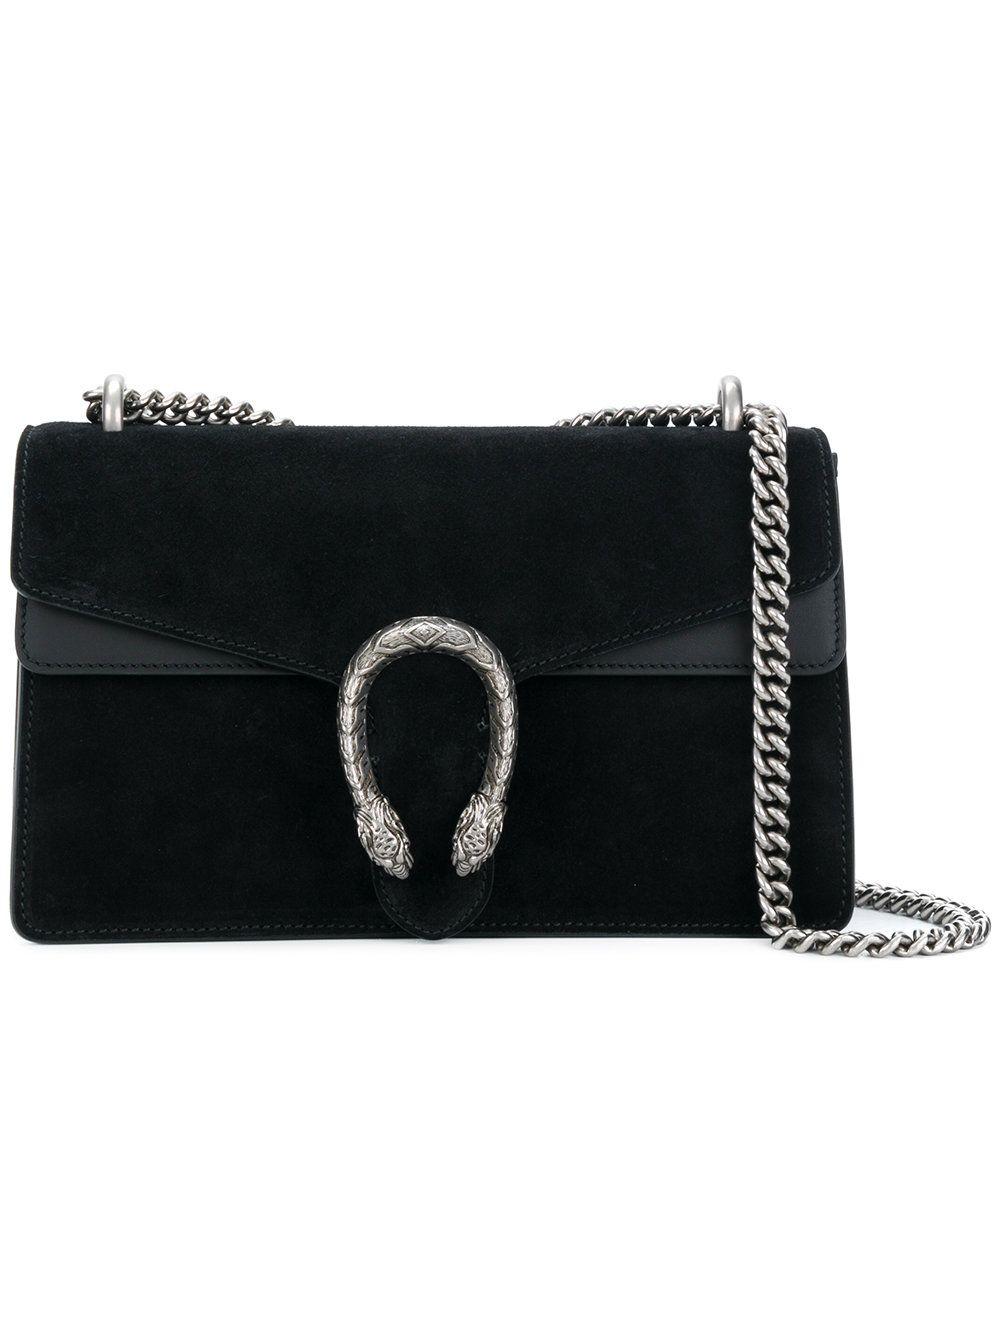 9d406741e33 GUCCI .  gucci  bags  shoulder bags  hand bags  suede     Gucci ...